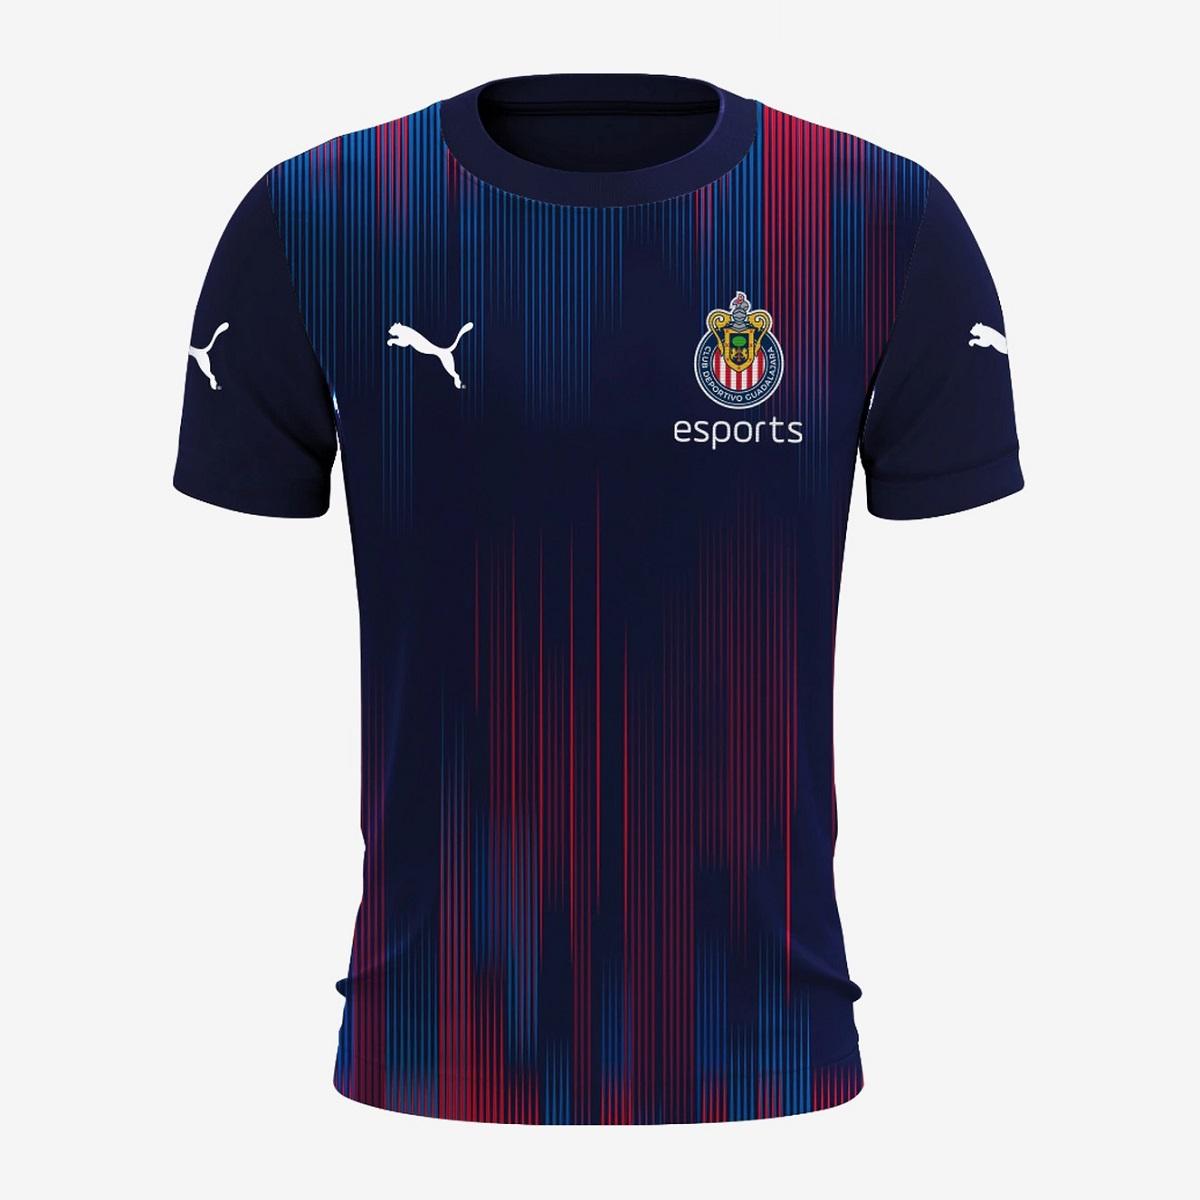 Camisa eSports do Chivas Guadalajara 2020-2021 PUMA